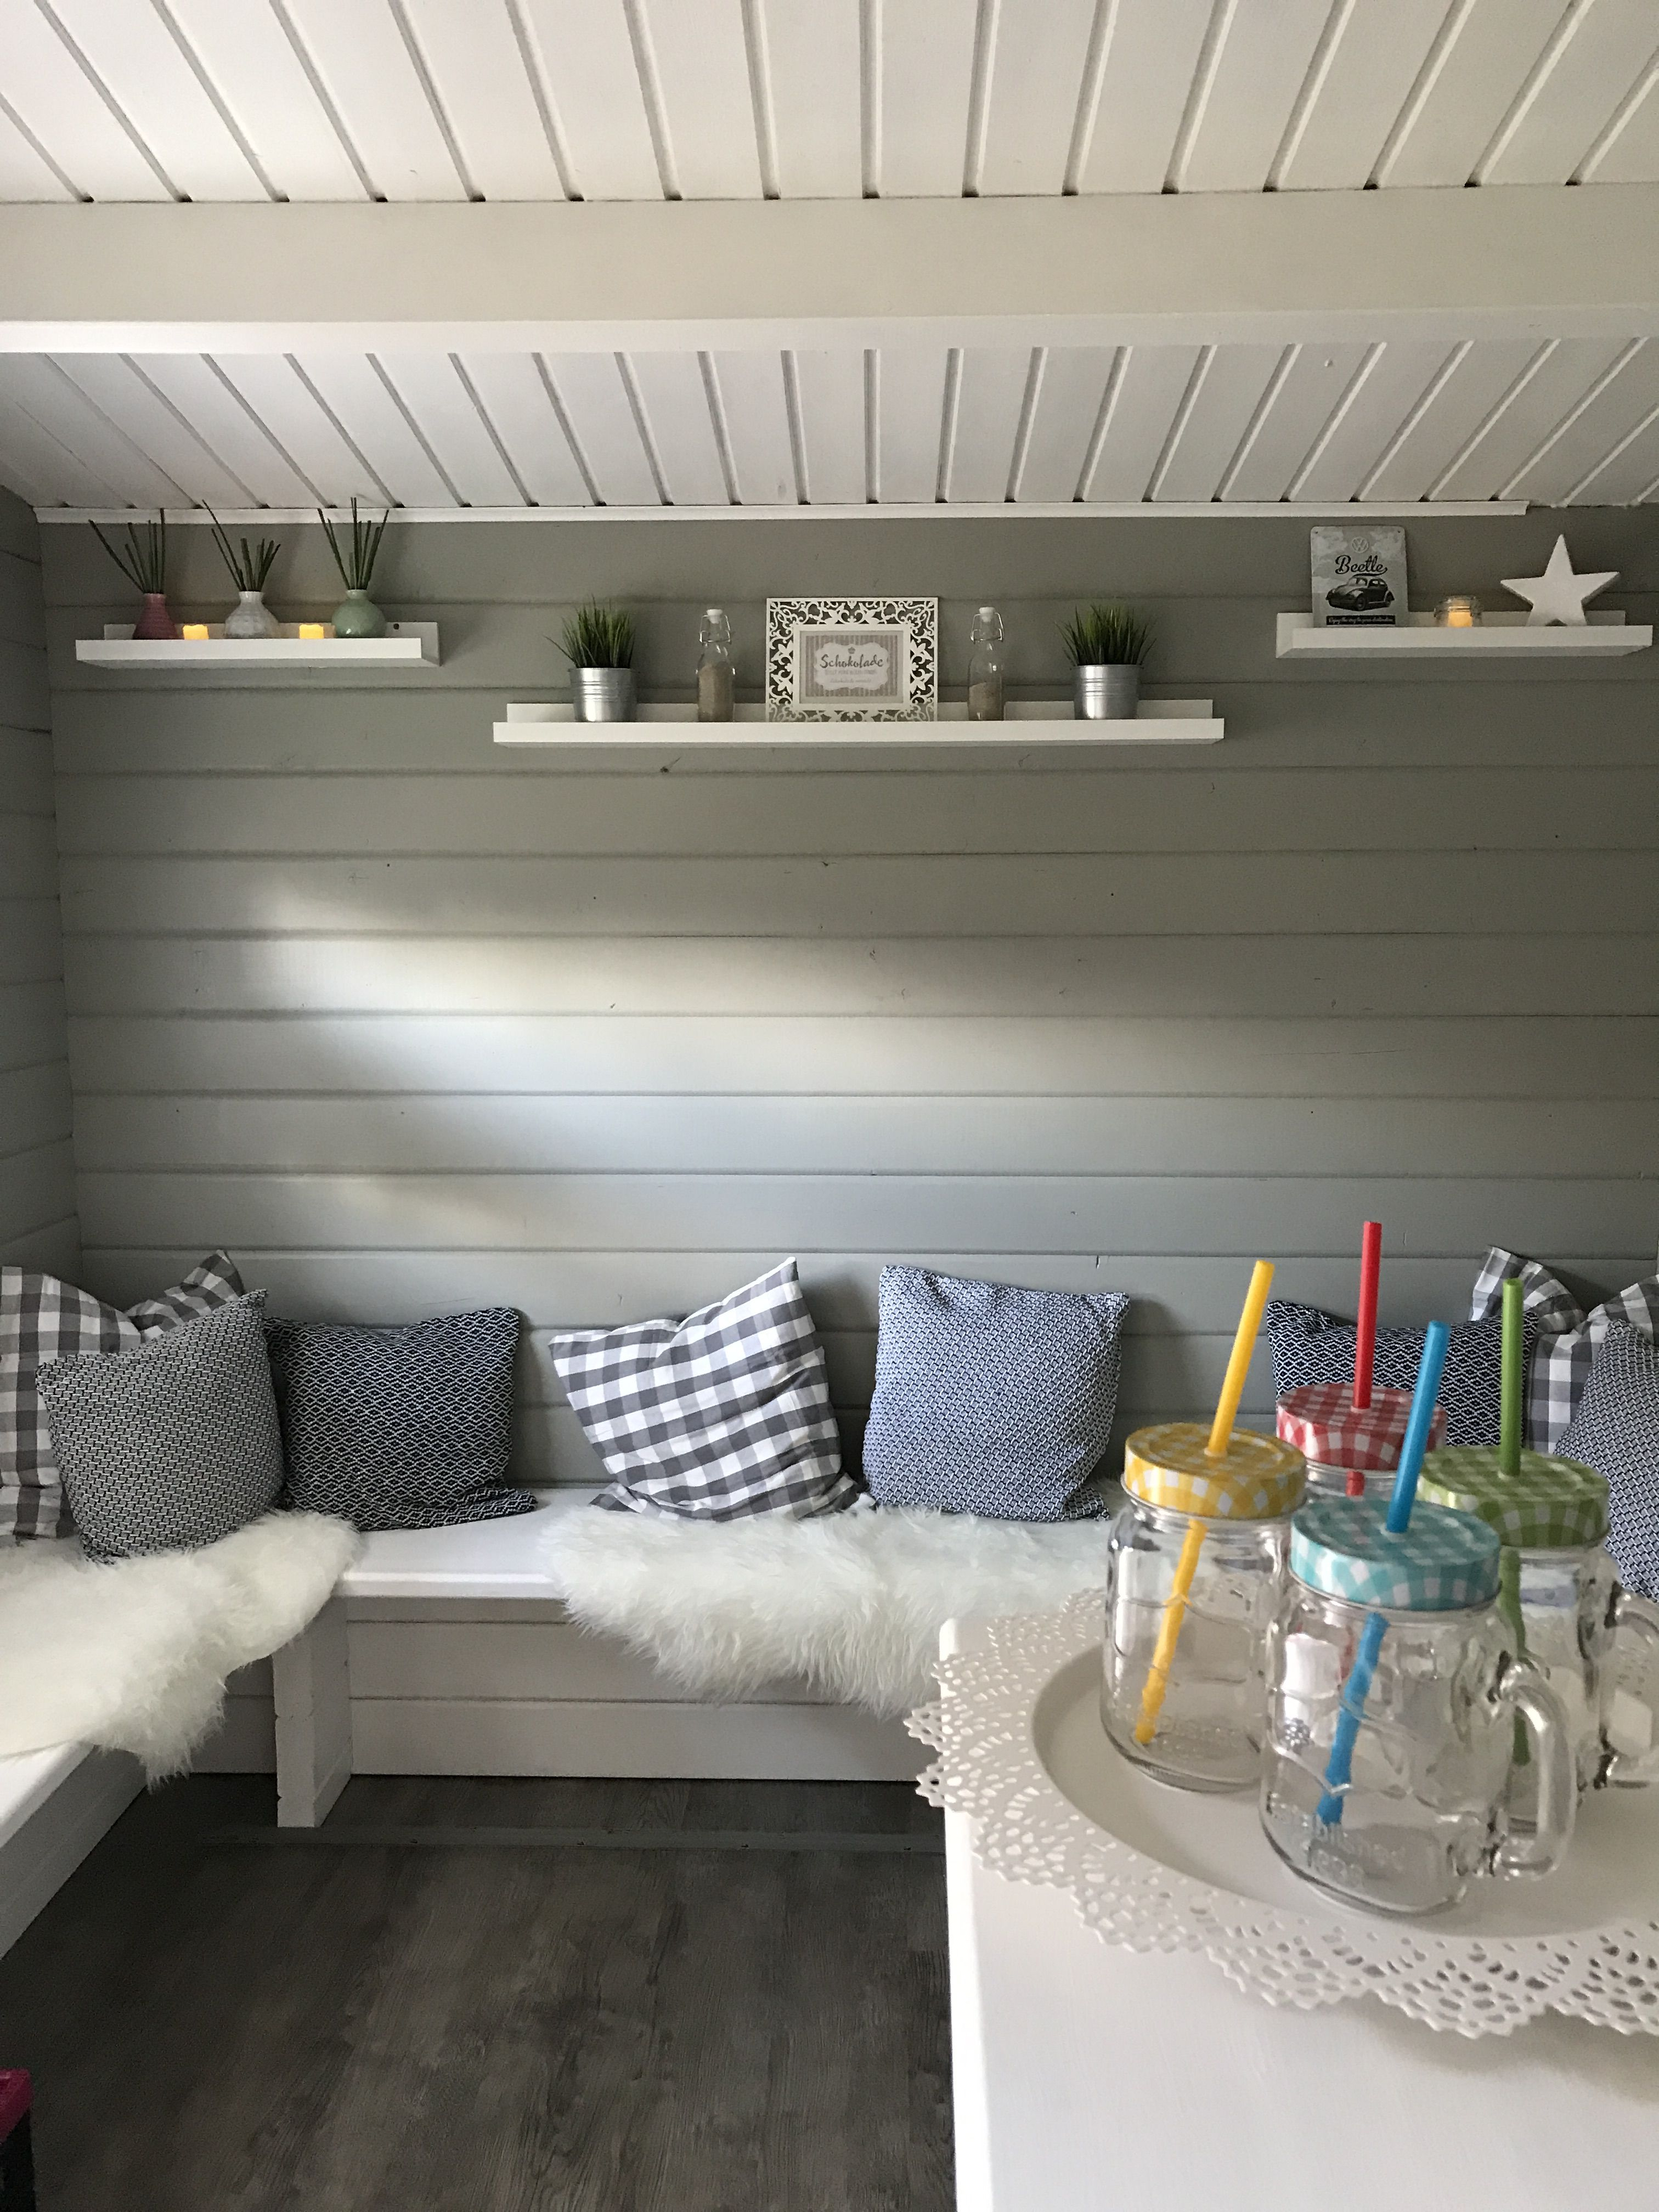 gartenhaus ideen inneneinrichtung strandhaus grau wei gartenhaus. Black Bedroom Furniture Sets. Home Design Ideas